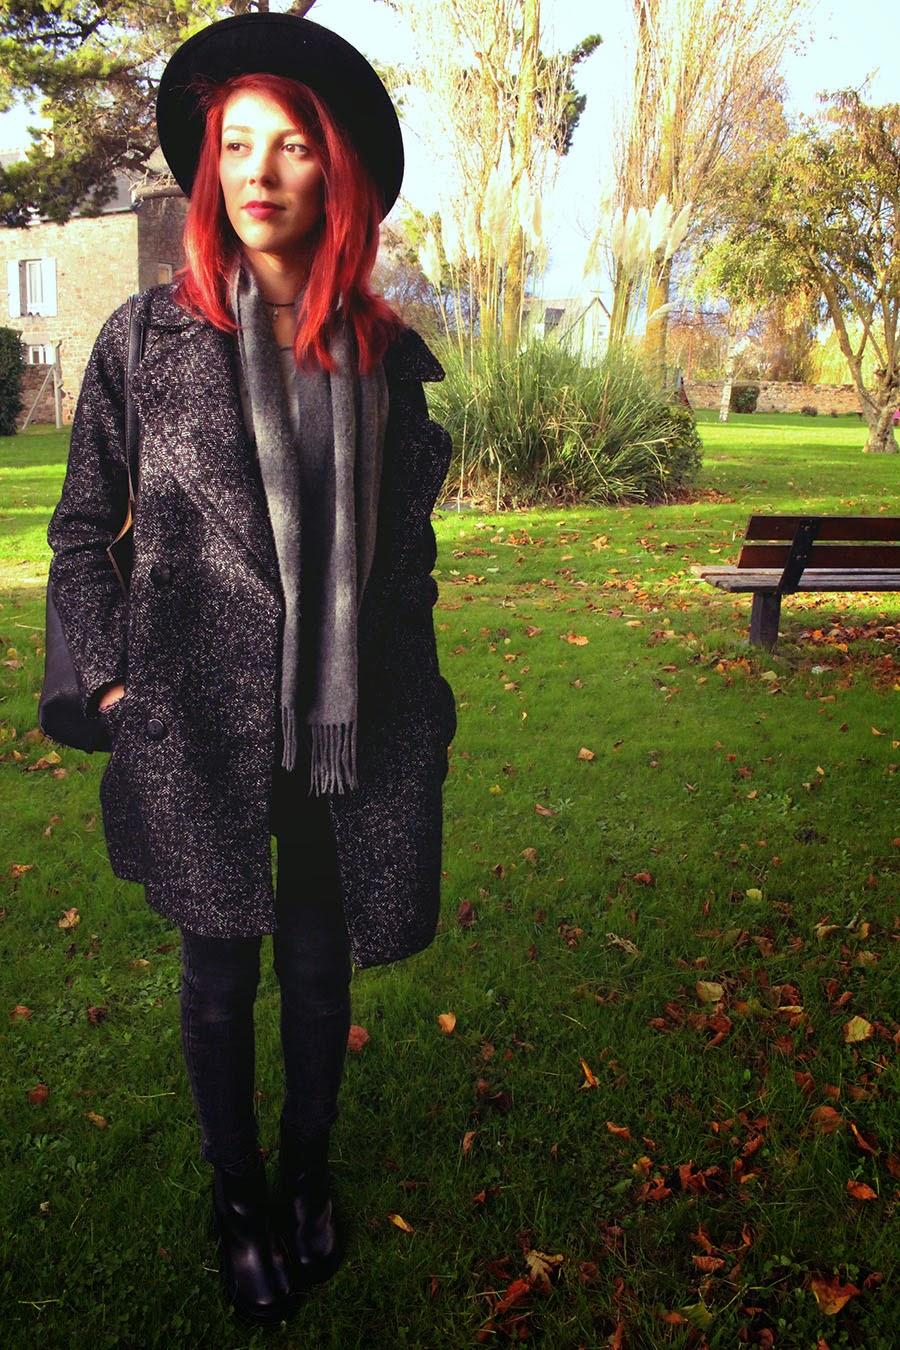 asos, automne, autumnal outfit, bag, boots, bottines, chelsea, ello ello, fall, fedora chapeau, hat, haul, hm, justfab, manteau oversize hm 2014, ootd, riverisland,